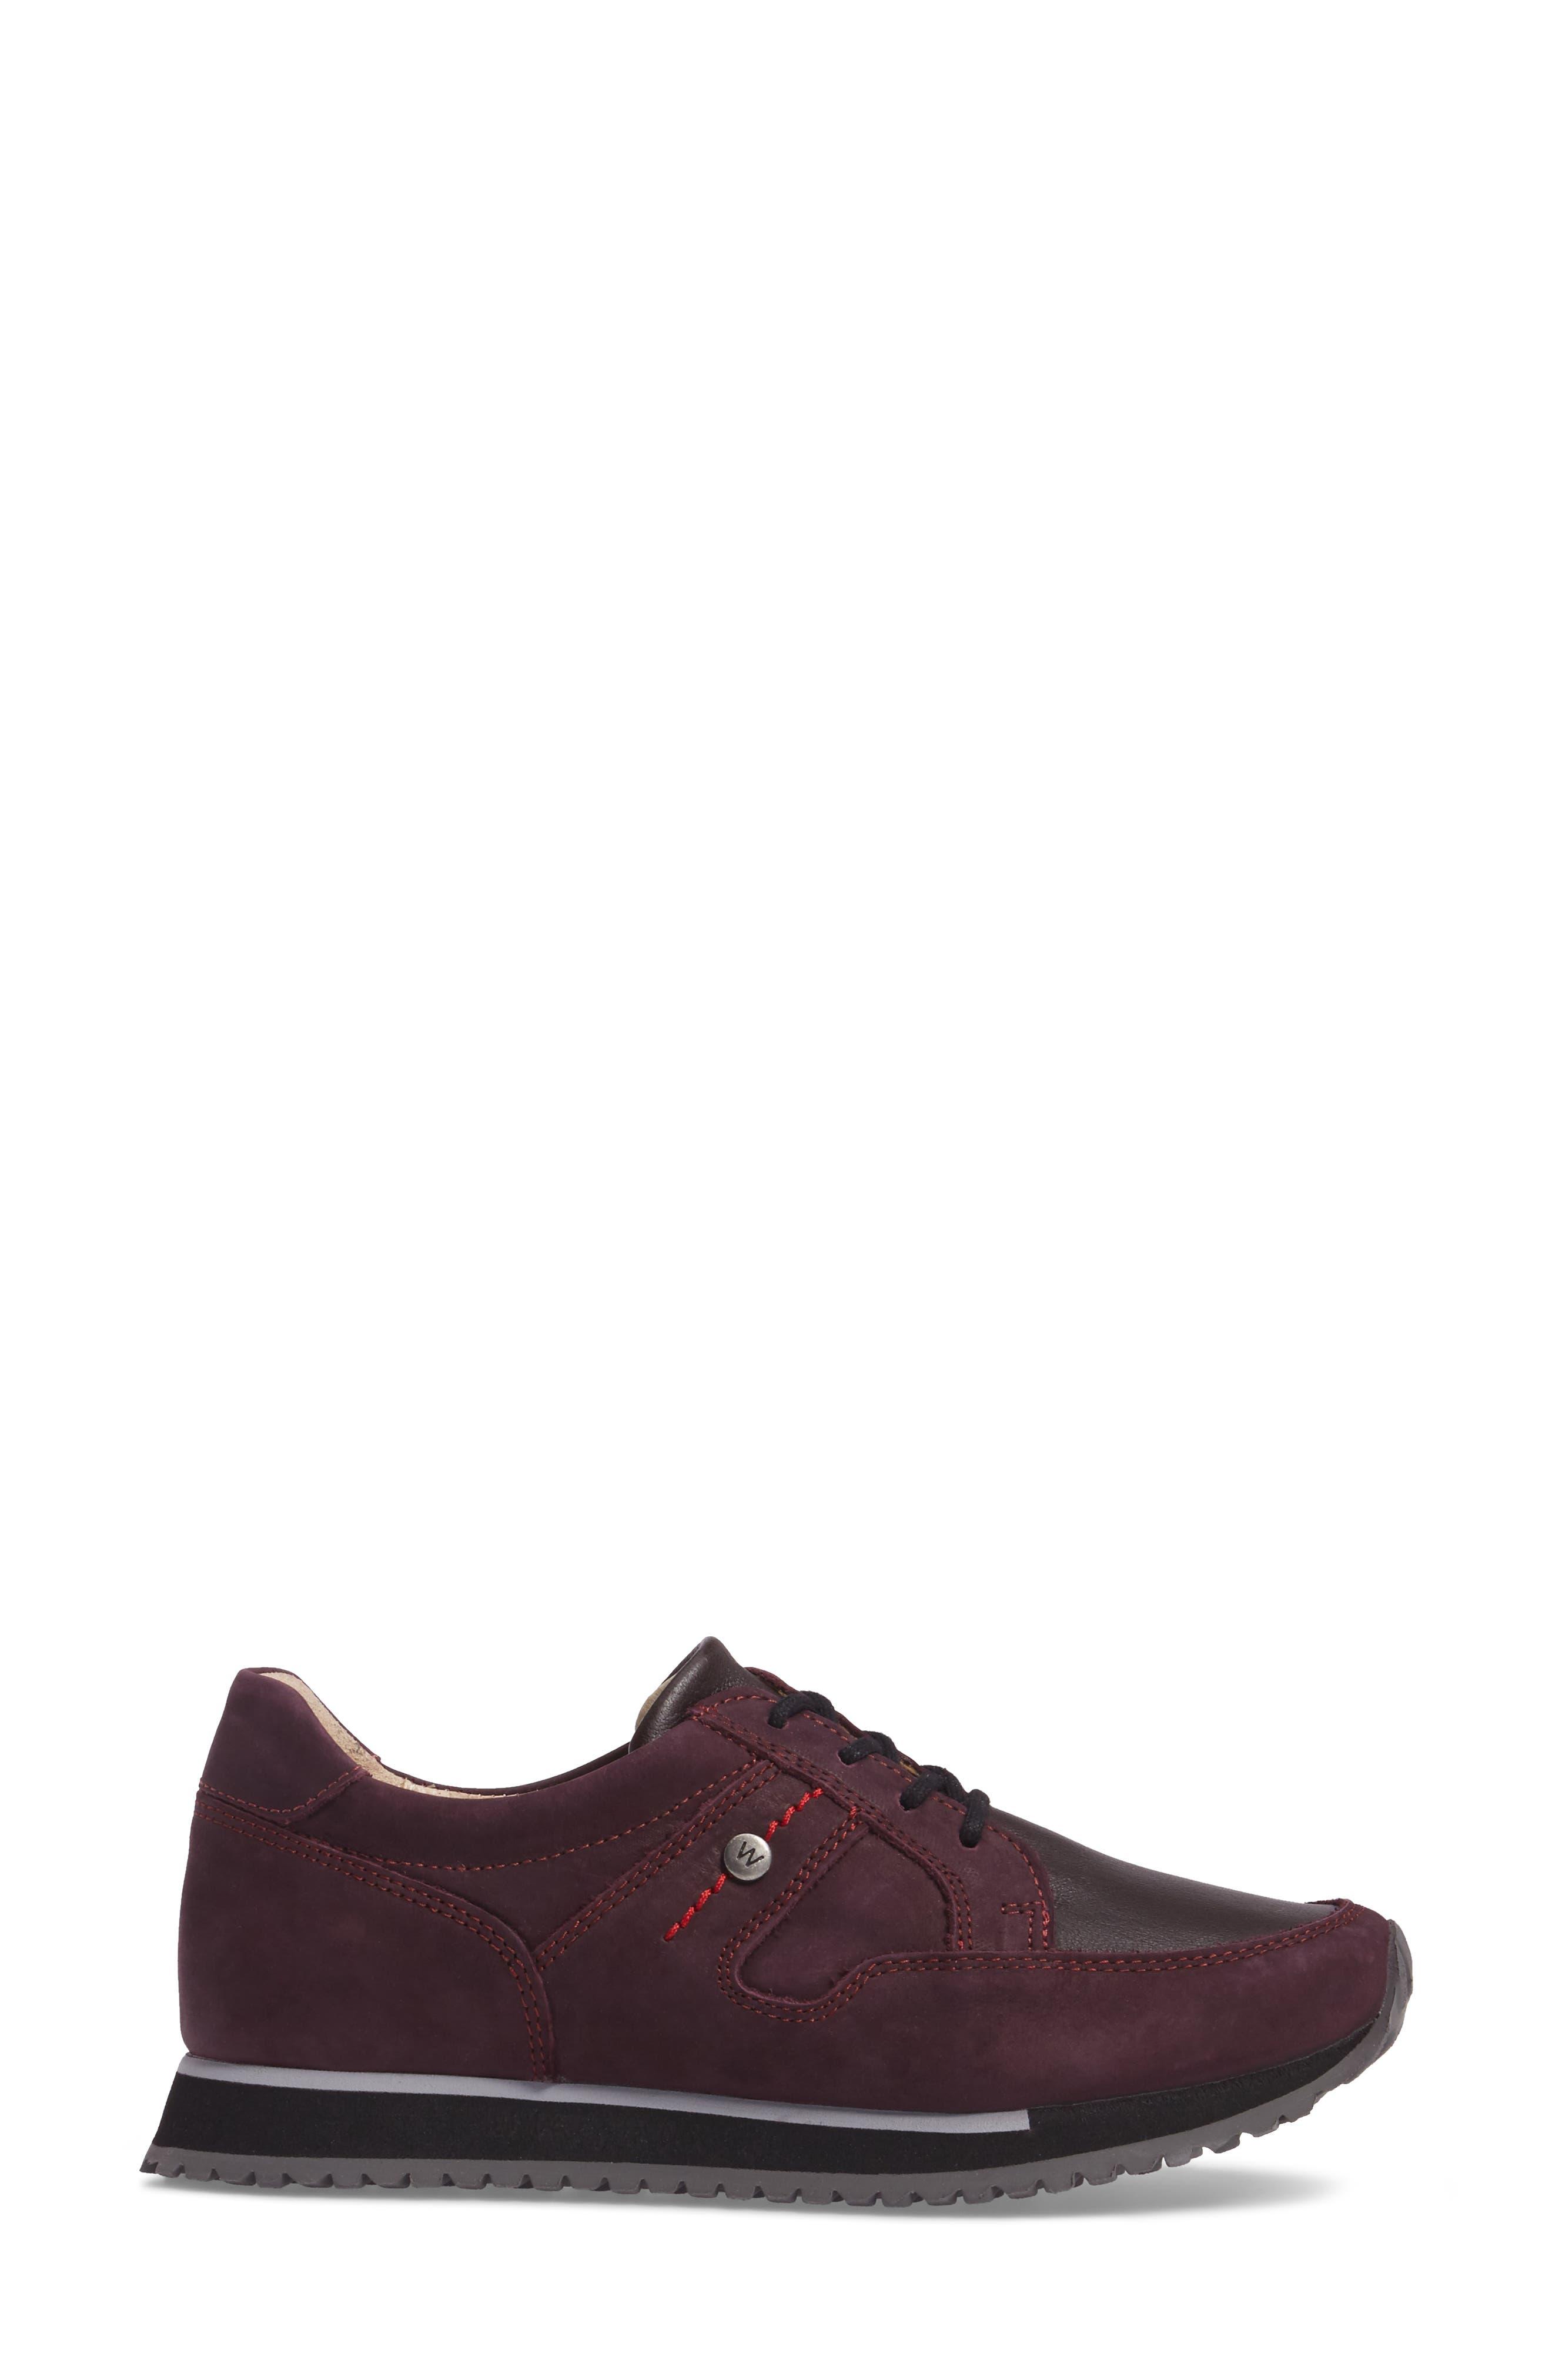 E-Walk Sneaker,                             Alternate thumbnail 3, color,                             BORDO LEATHER